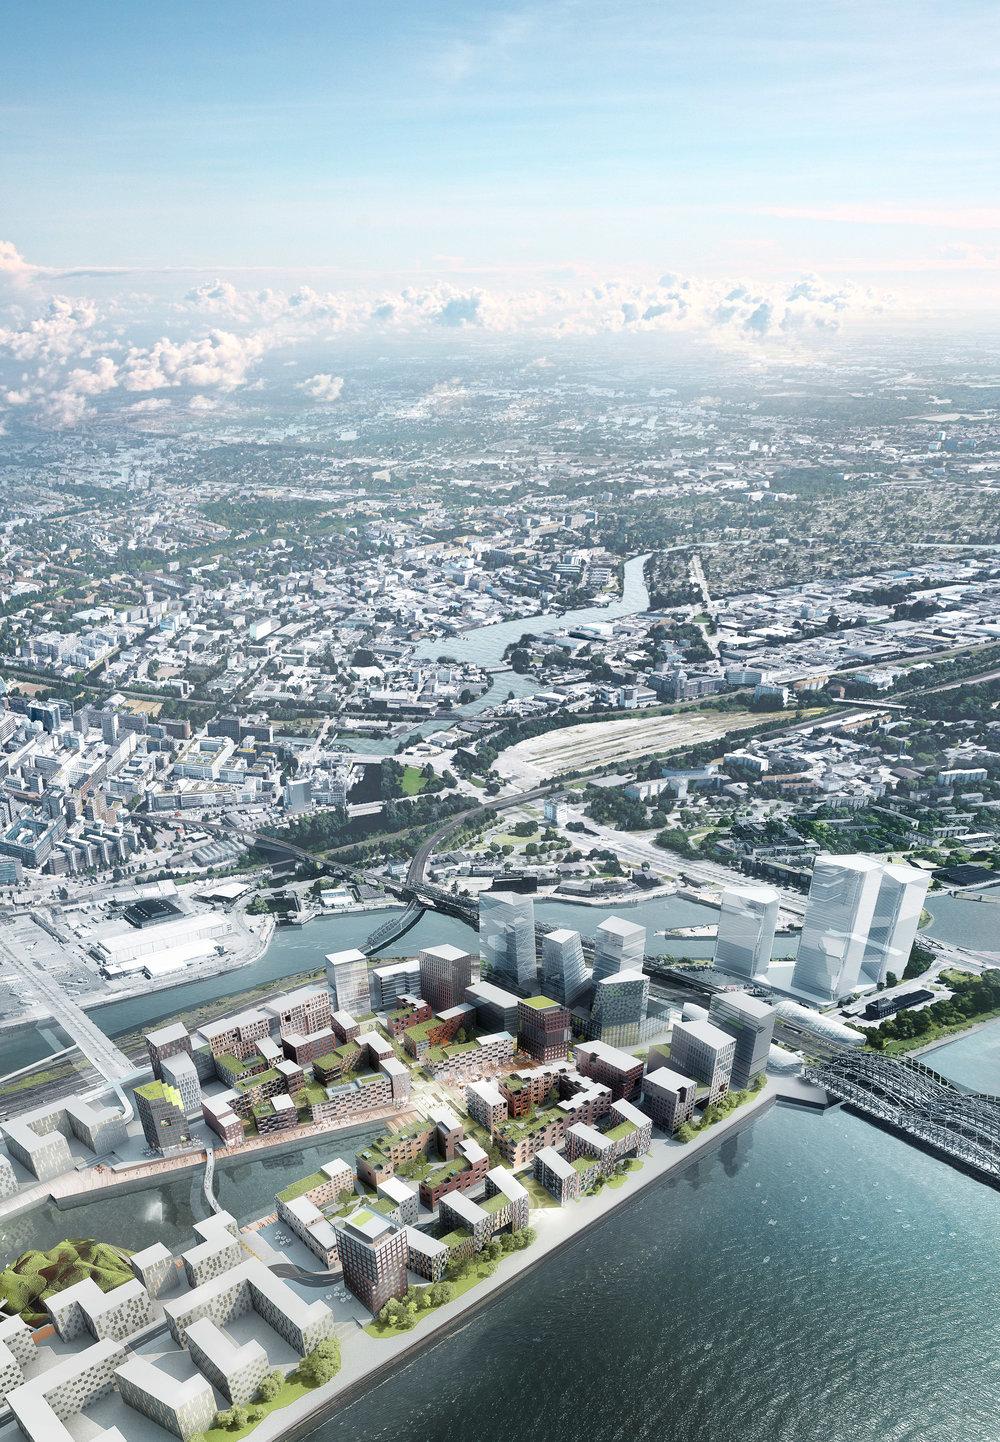 Hafencity - Masterplan project in Hamburg, Germany.